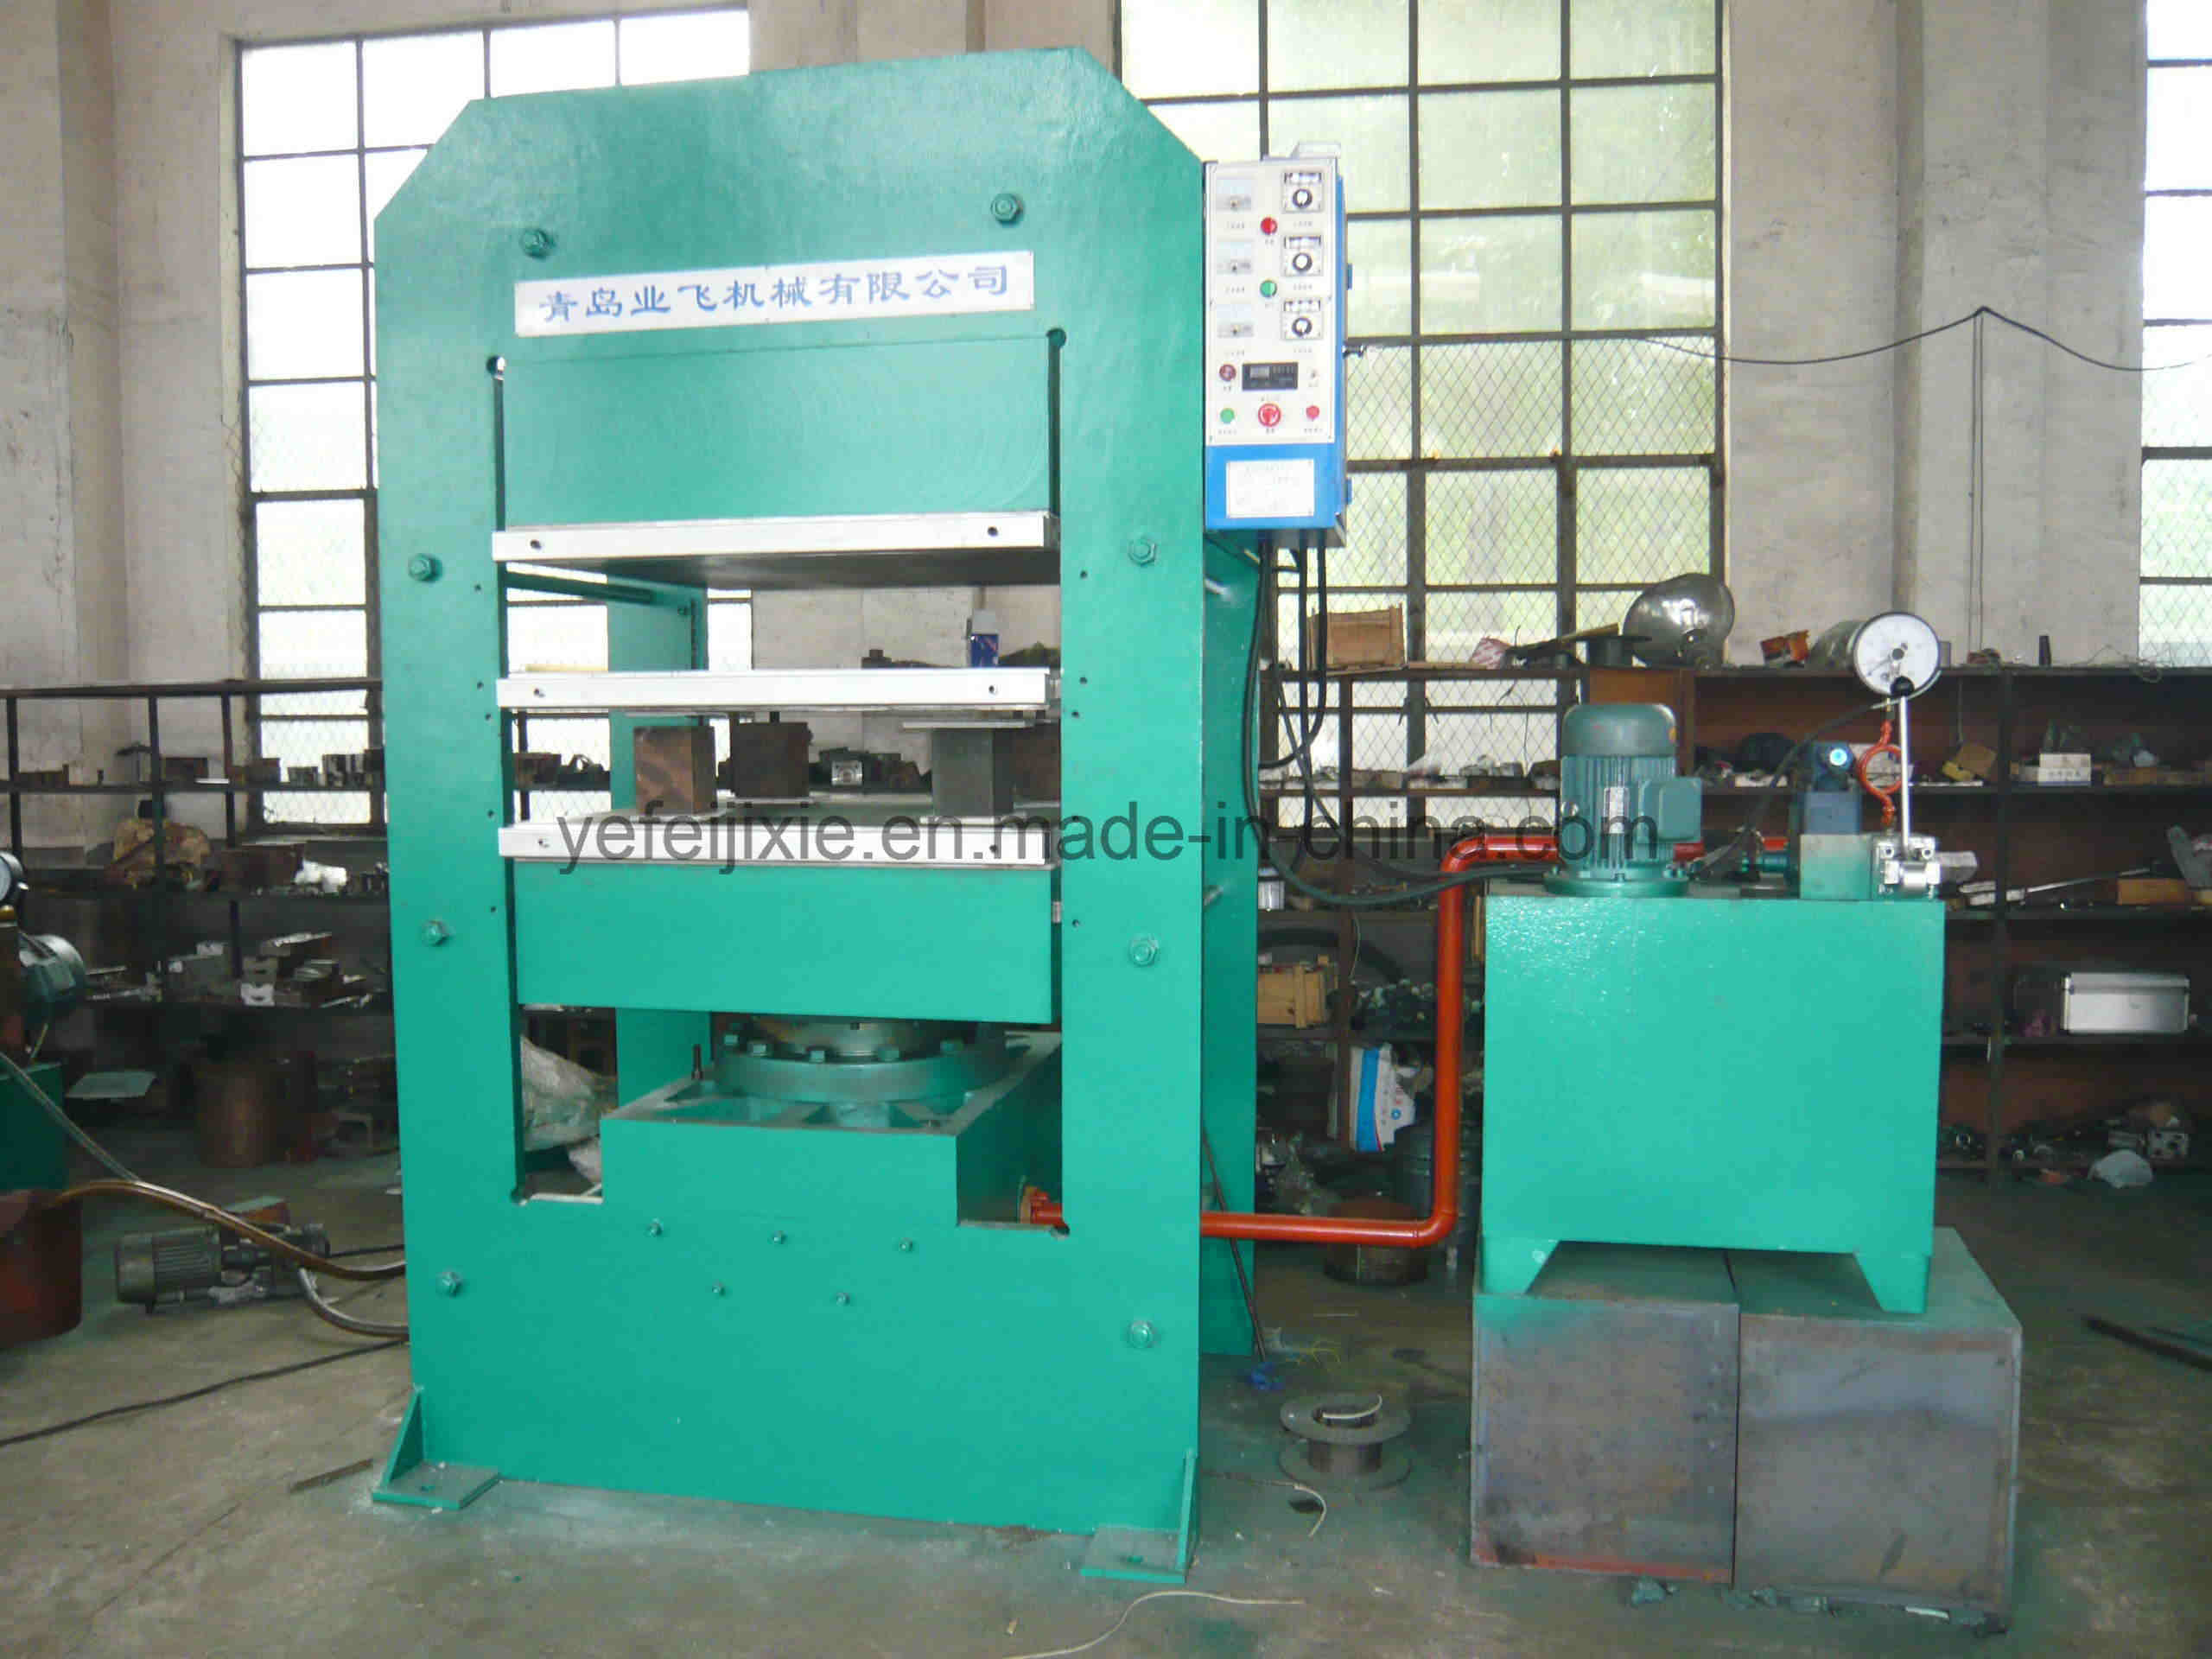 China Hot Sale Rubber Vulcanizer Plate Vulcanizing Press Machine Rubber Machine Mixing Mill